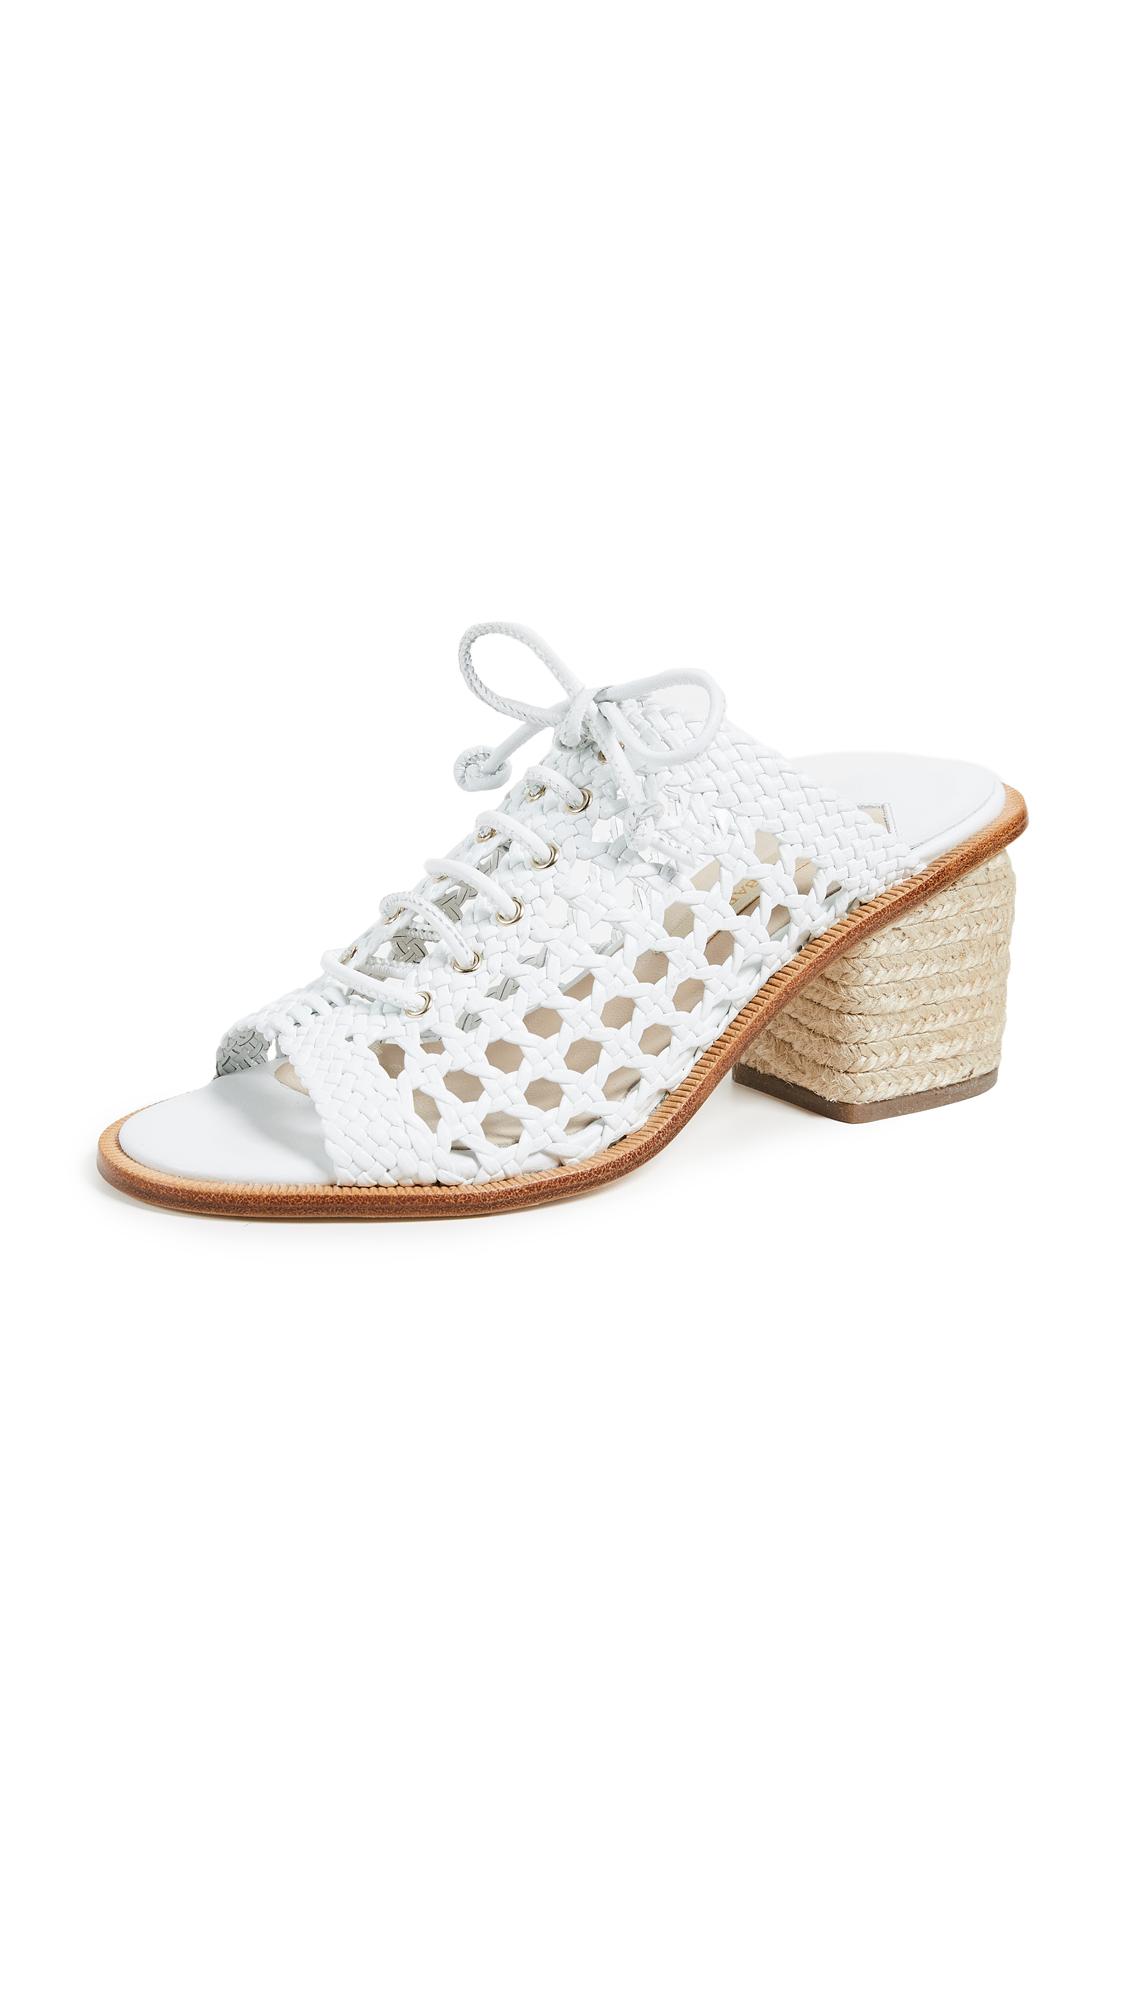 Paloma Barcelo Capsilum City Sandals - White